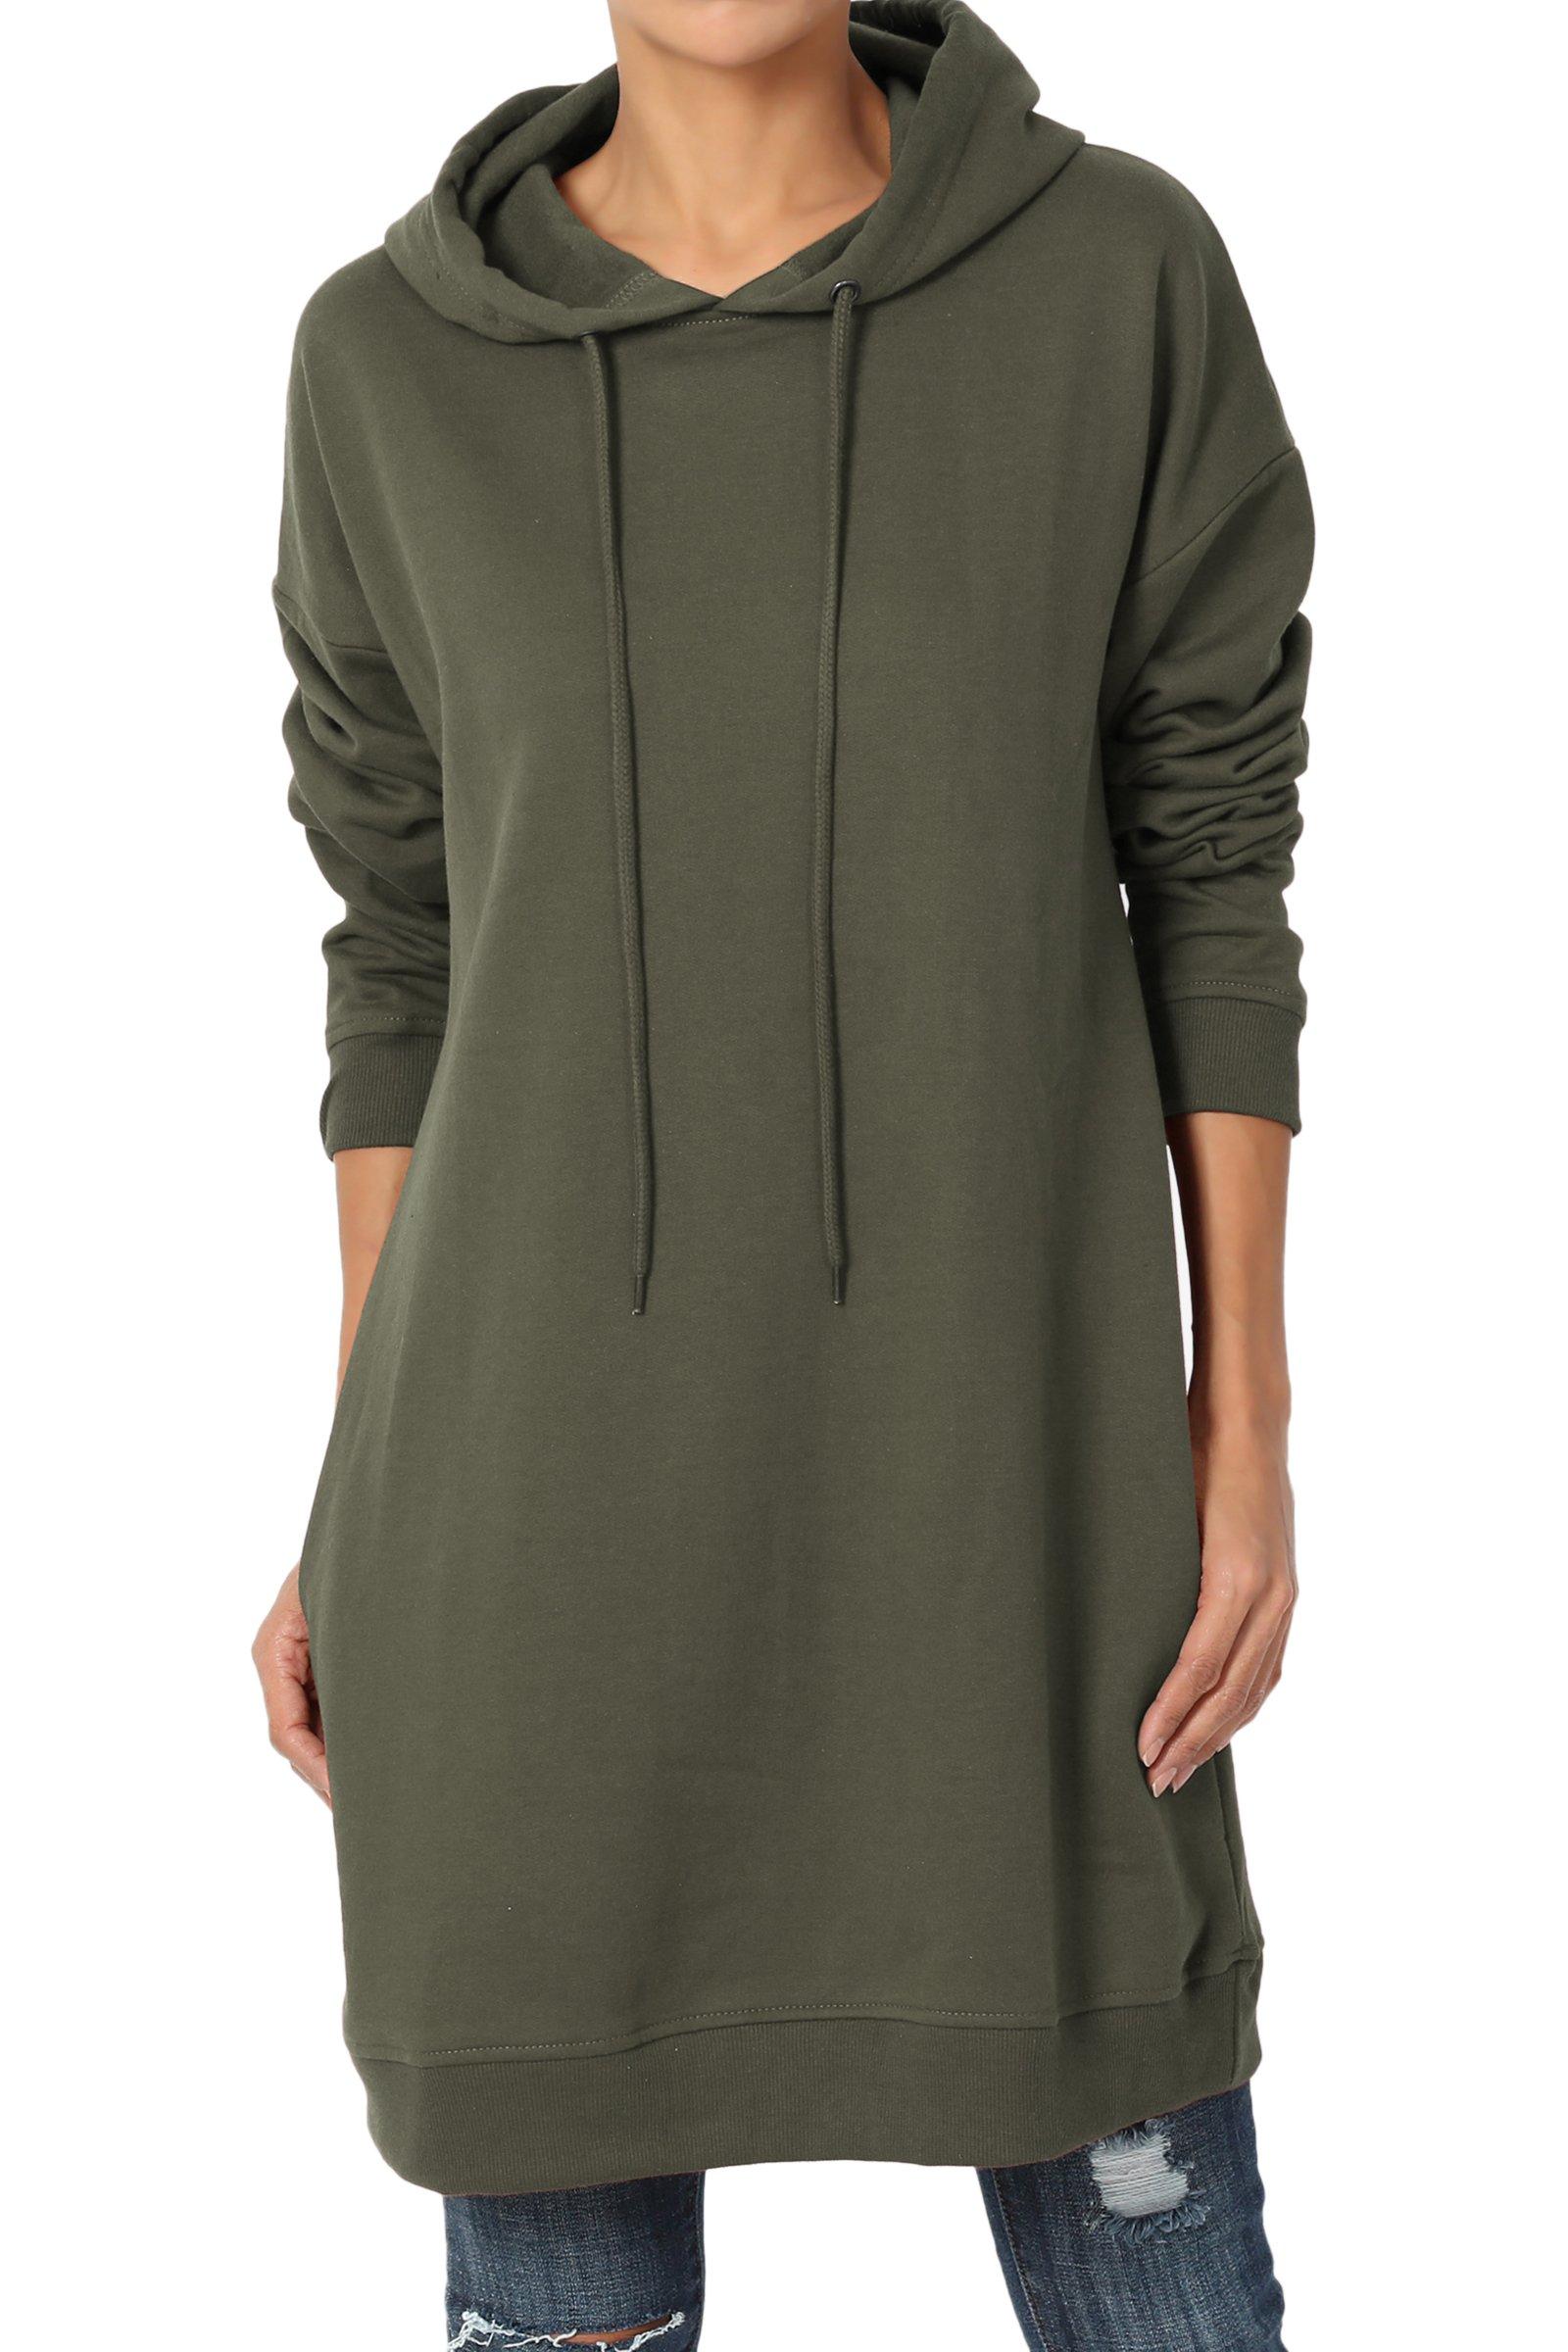 TheMogan Women's Hoodie Loose Fit Pocket Tunic Sweatshirts Olive S/M